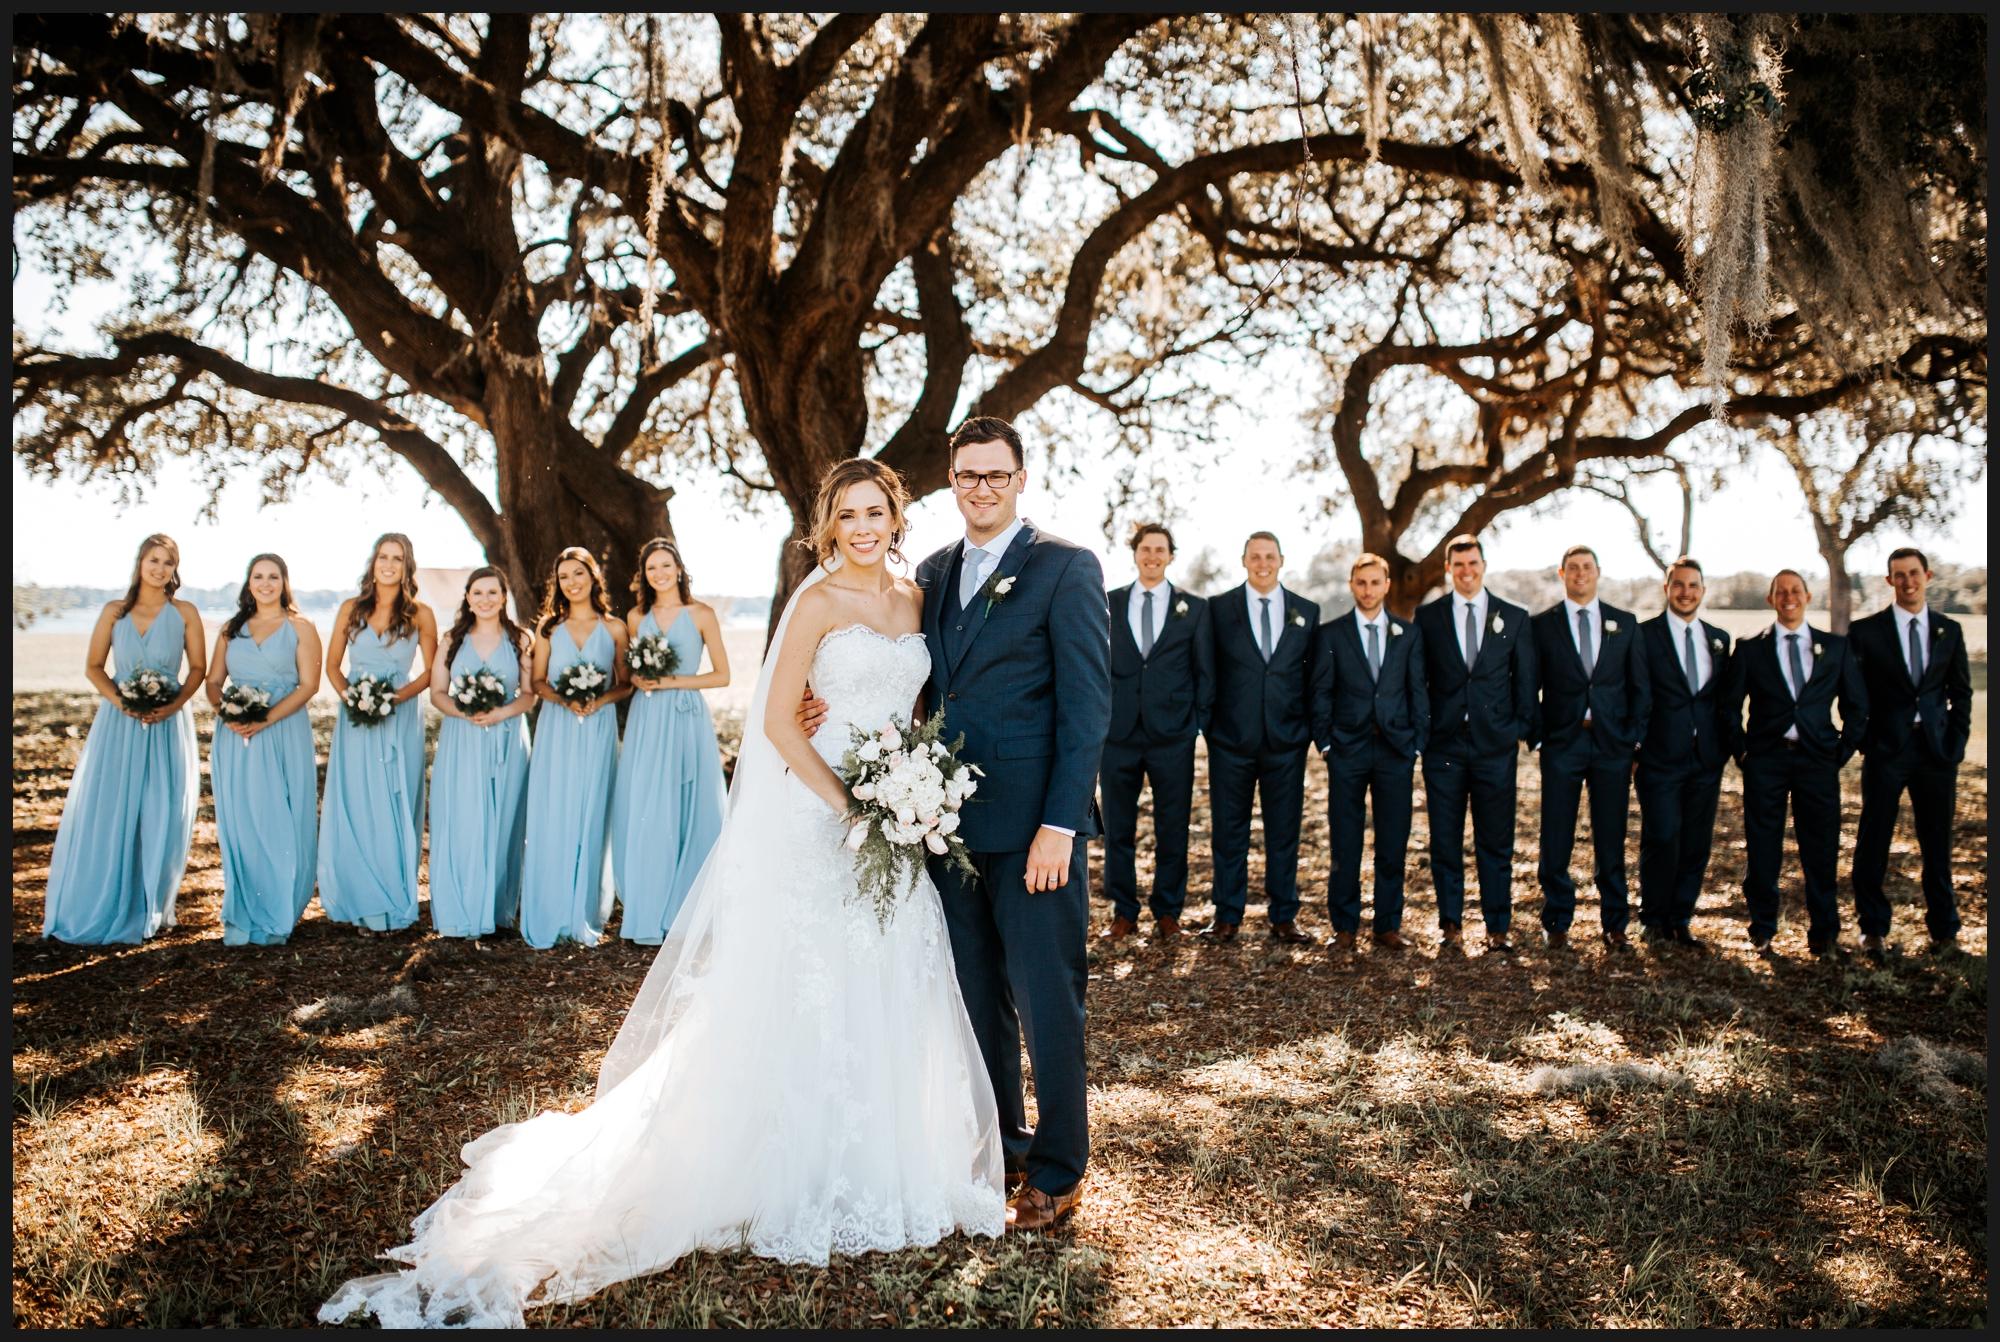 Orlando-Wedding-Photographer-destination-wedding-photographer-florida-wedding-photographer-bohemian-wedding-photographer_0075.jpg